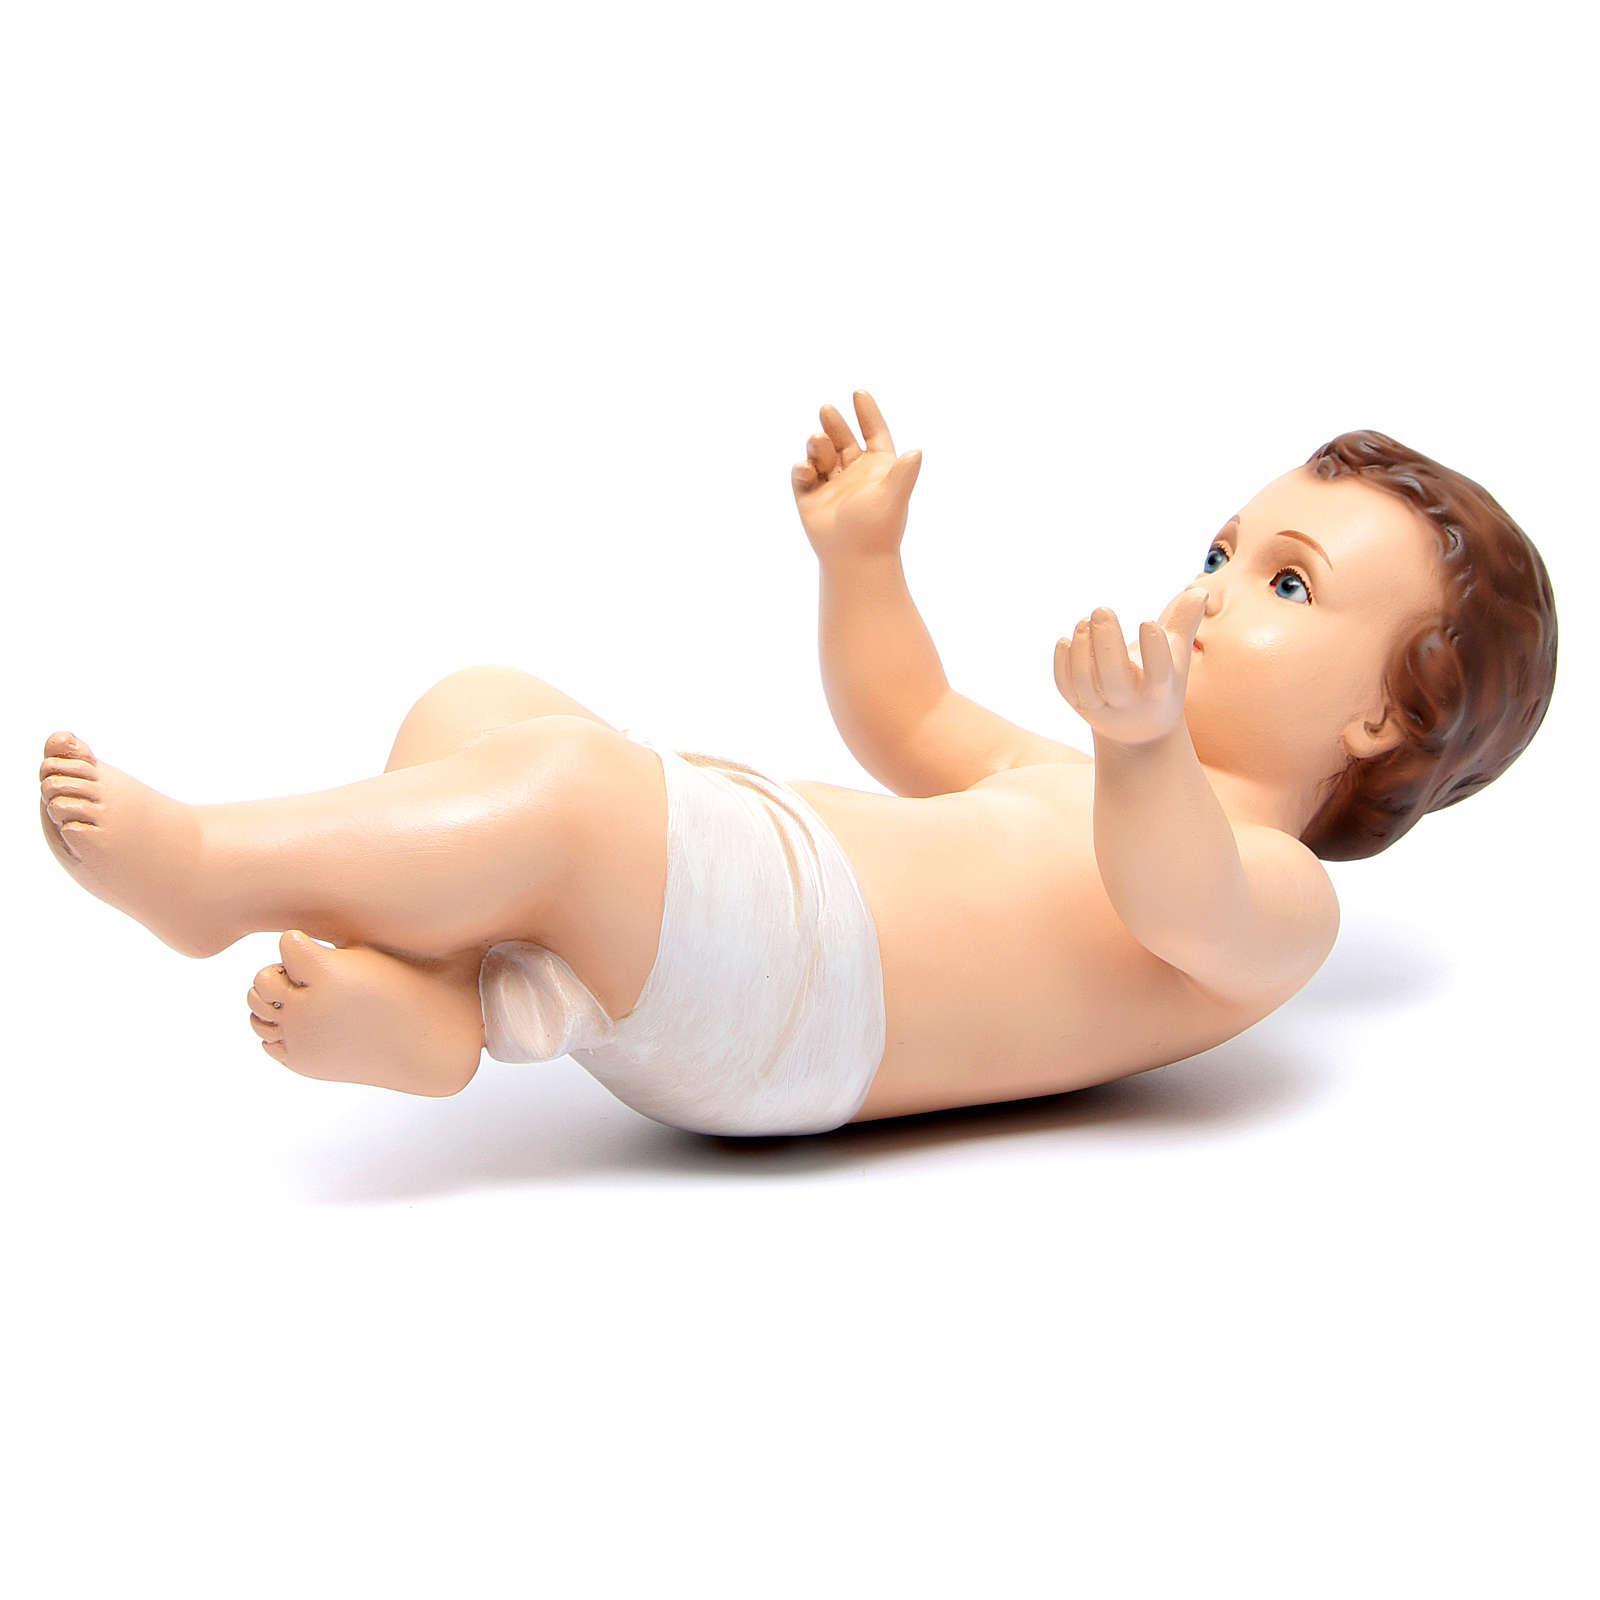 Baby Jesus, naked with crystal eyes, 46cm Landi 3